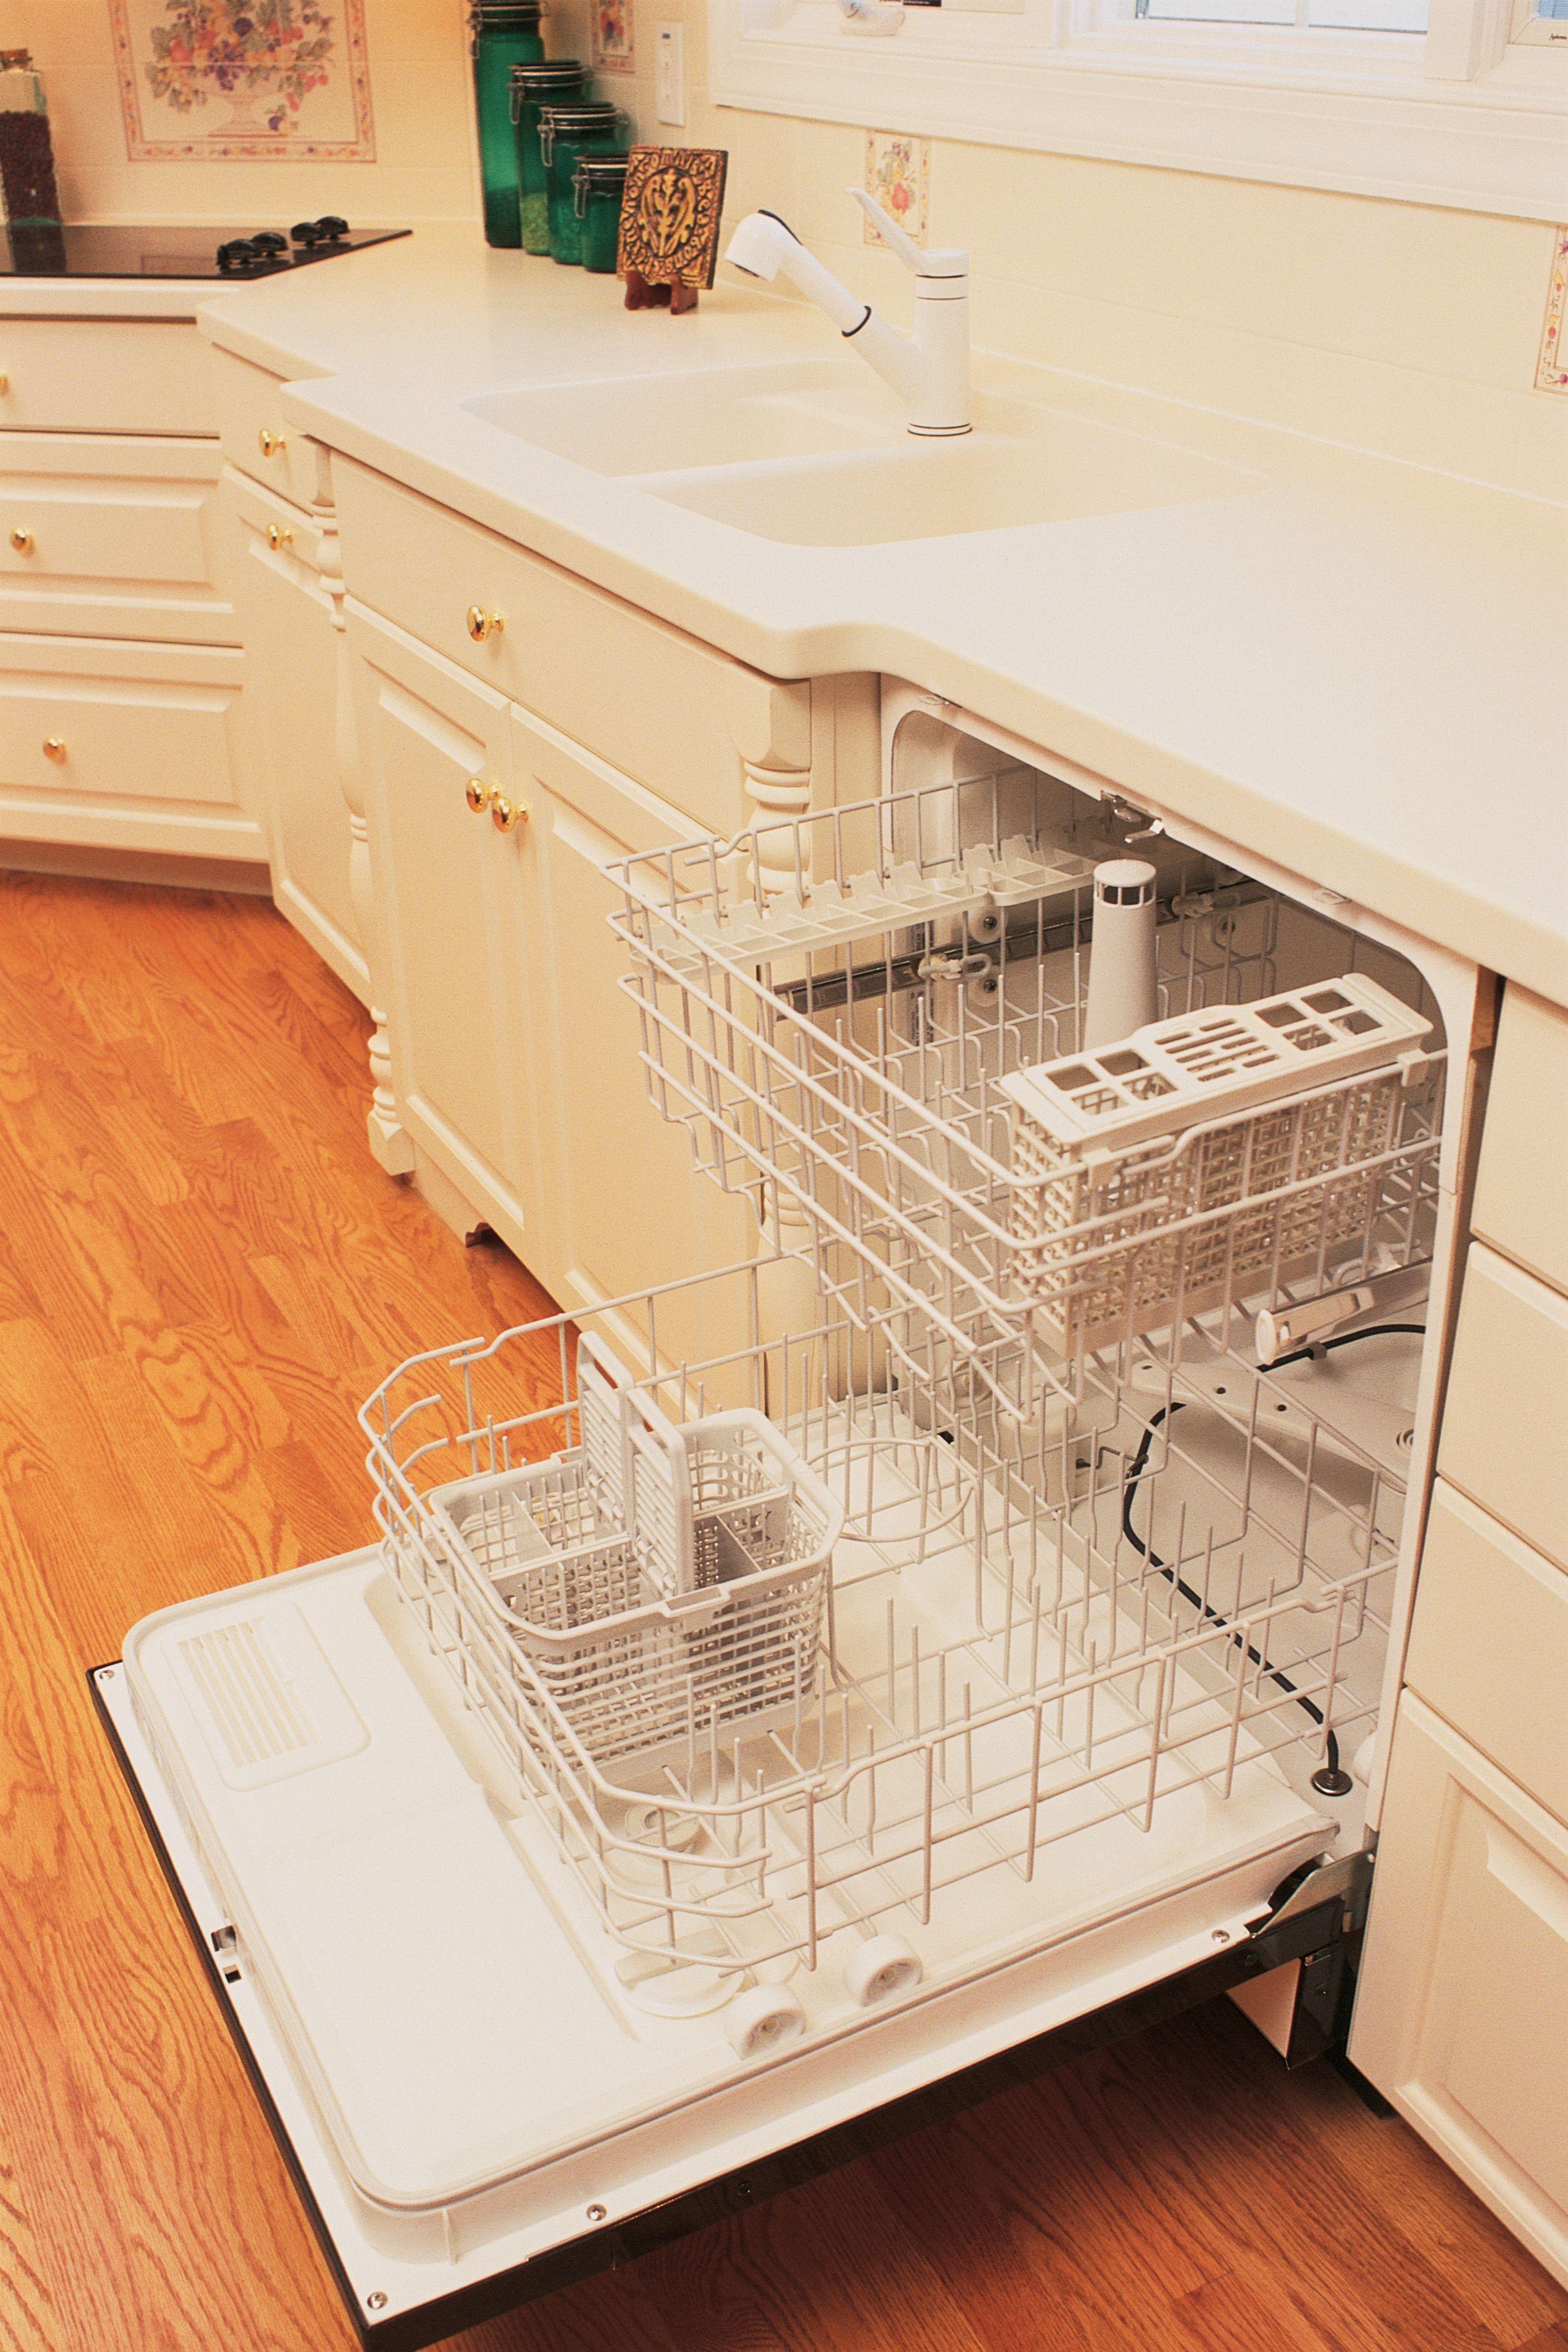 How To Fix Sitting Water In Dishwashers Dishwasher Not Draining Dishwasher Unclog Drain